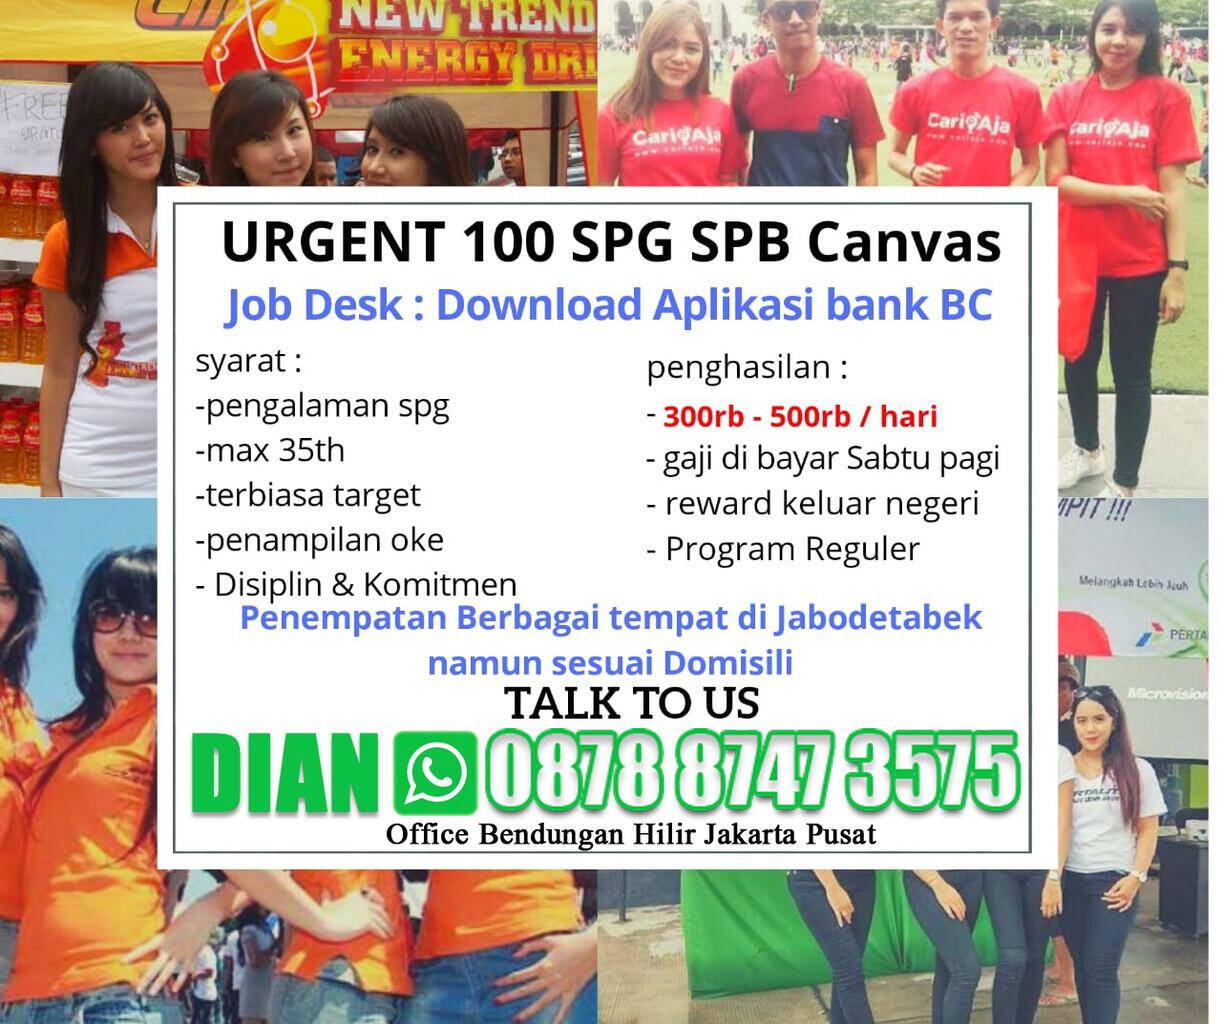 Lowongan Kerja SPB atau SPG Produk Bank Ternama